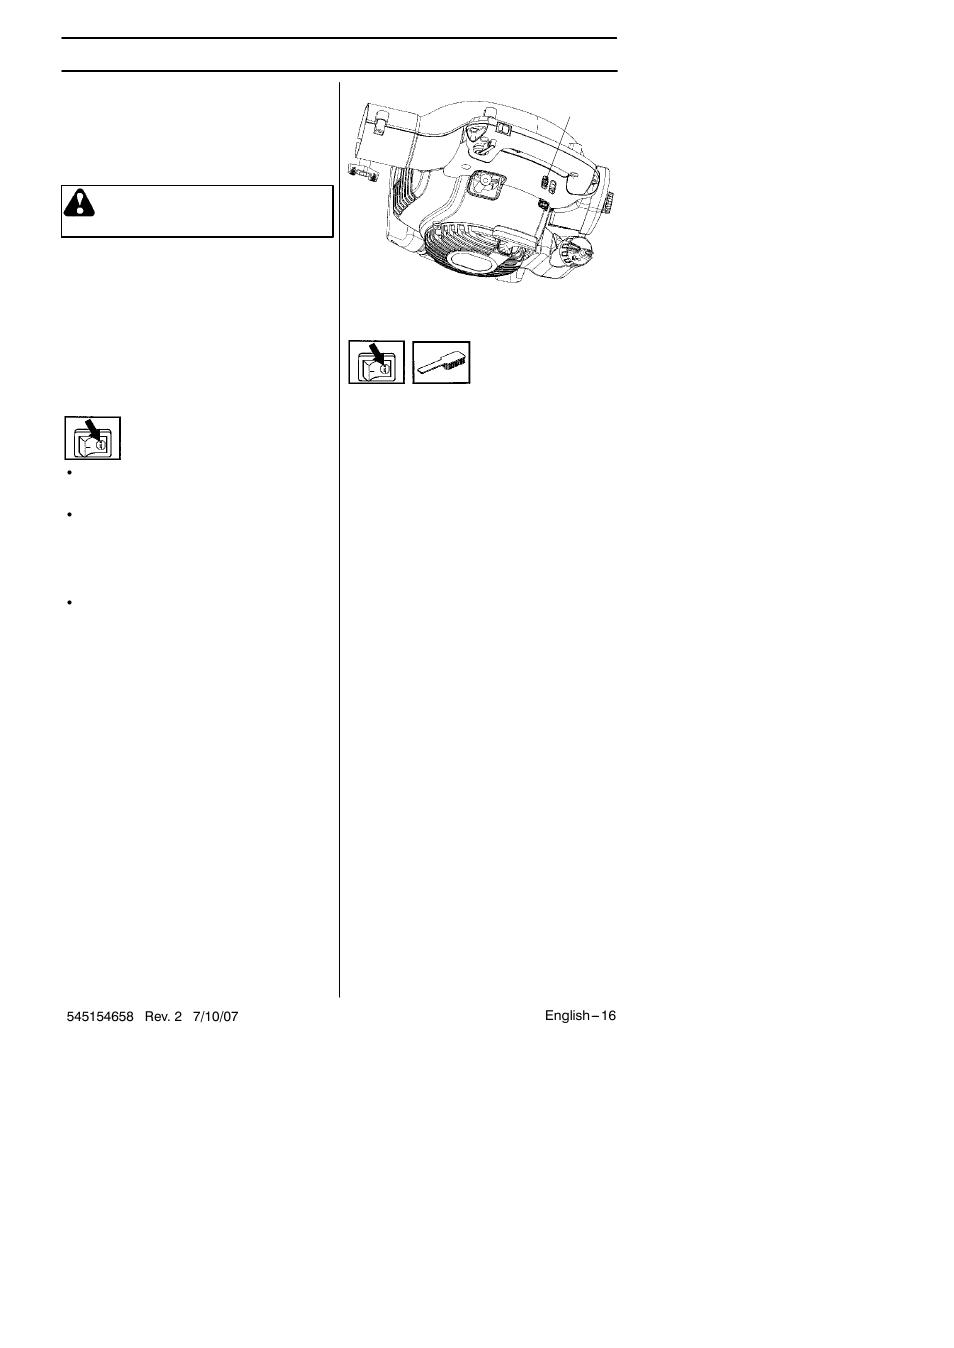 Maintenance | Husqvarna 125B User Manual | Page 16 / 47